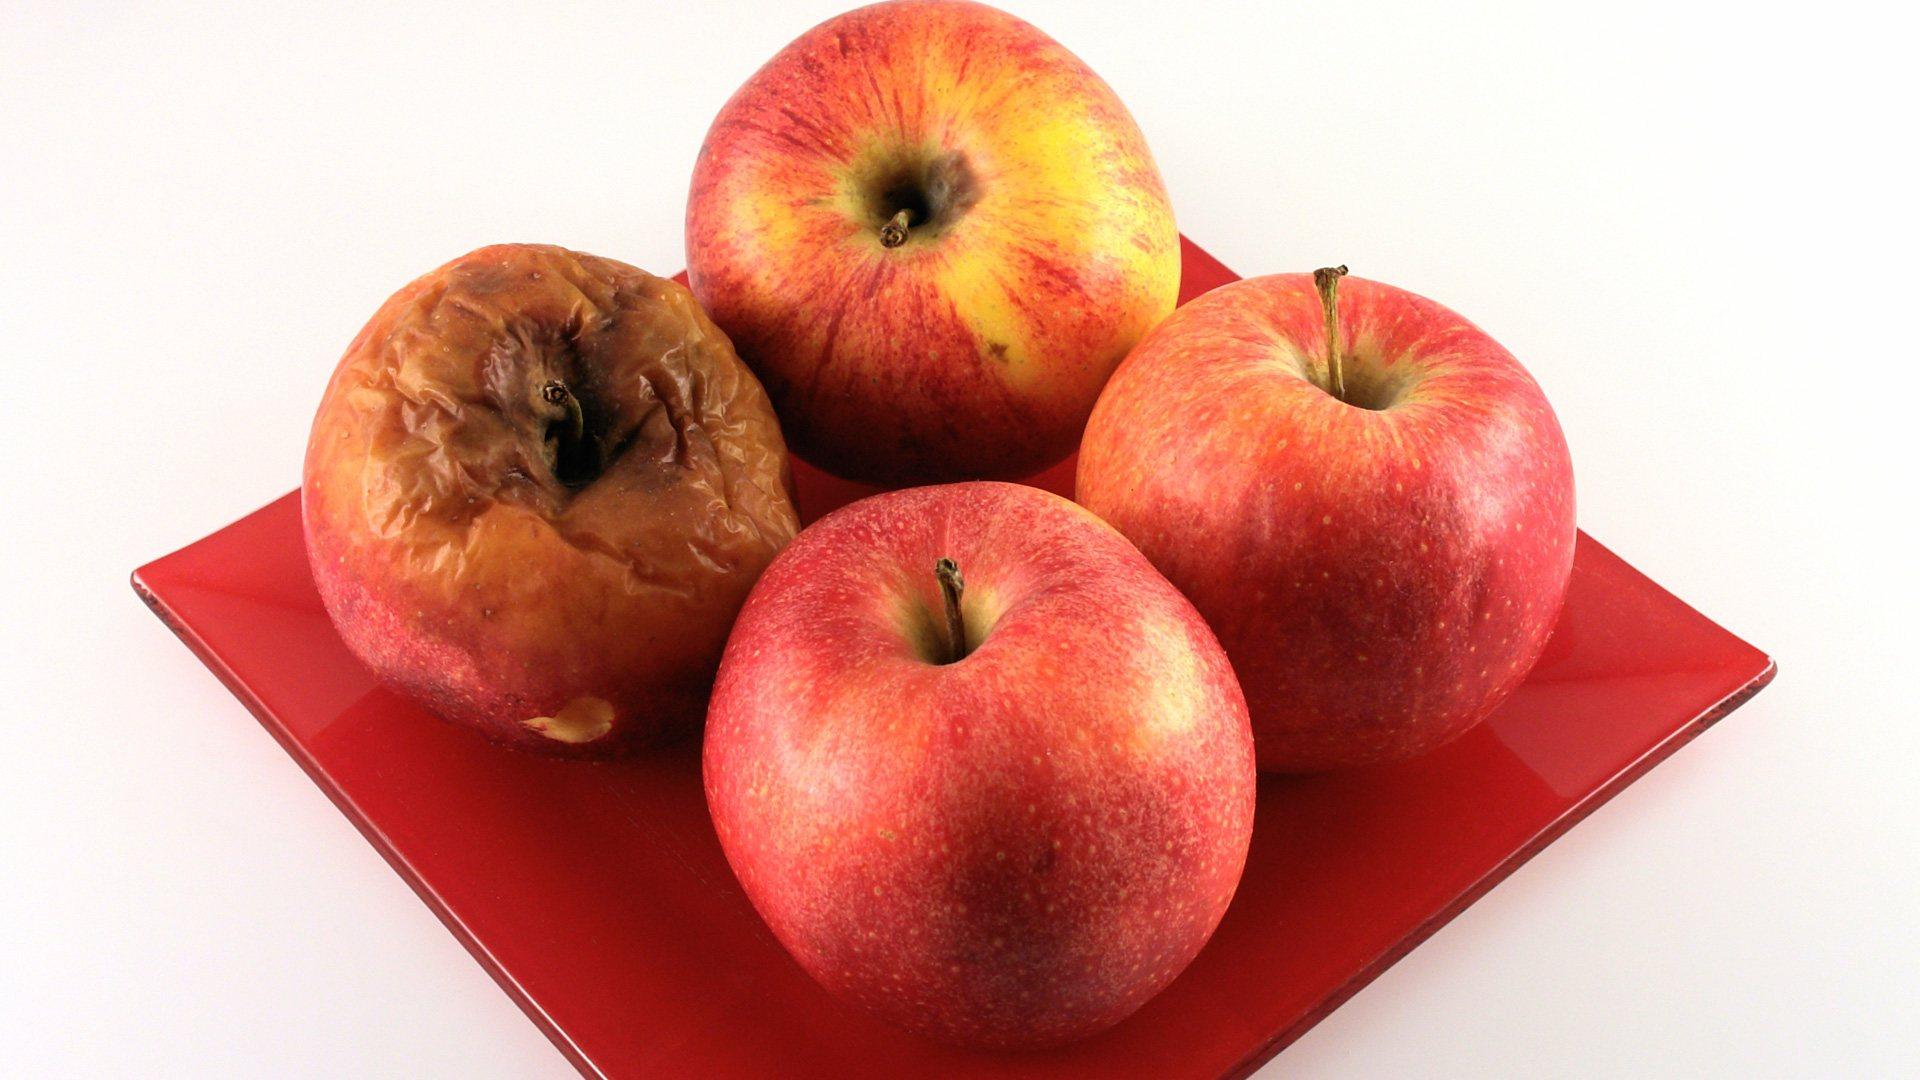 Fruit Storage - The Secret Shenanigans in the Fruit Bowl